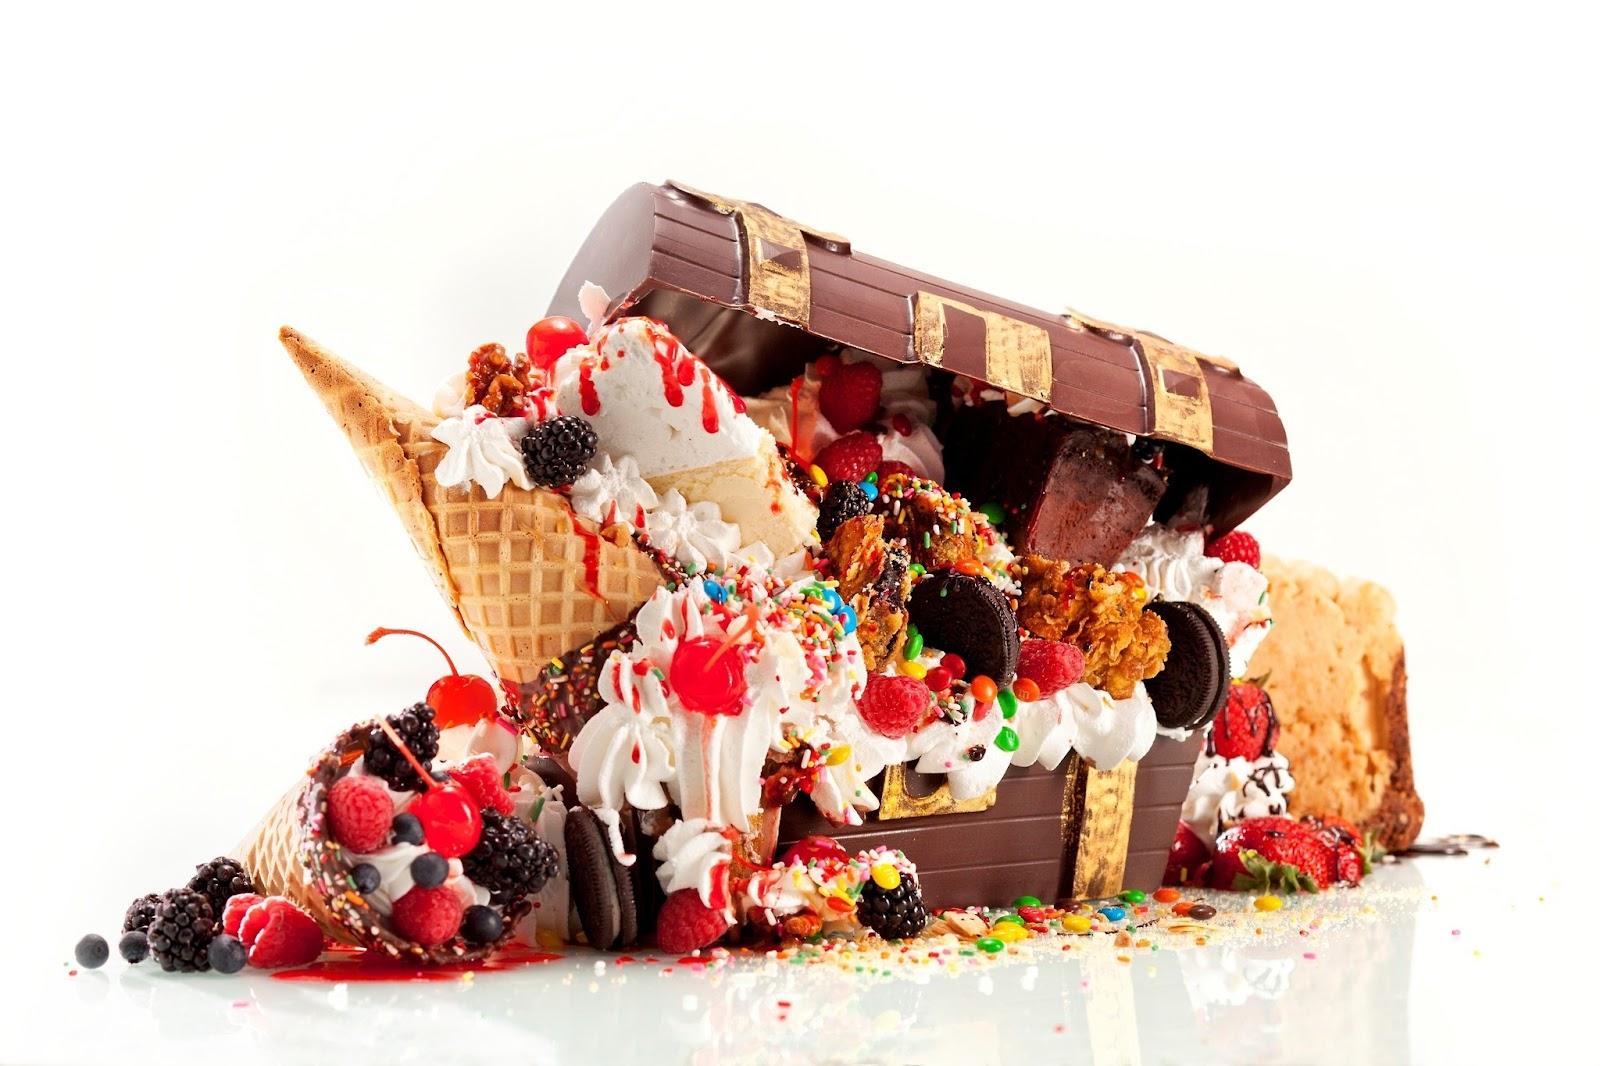 la-ss-decadent-desserts-20131113-dto.jpg